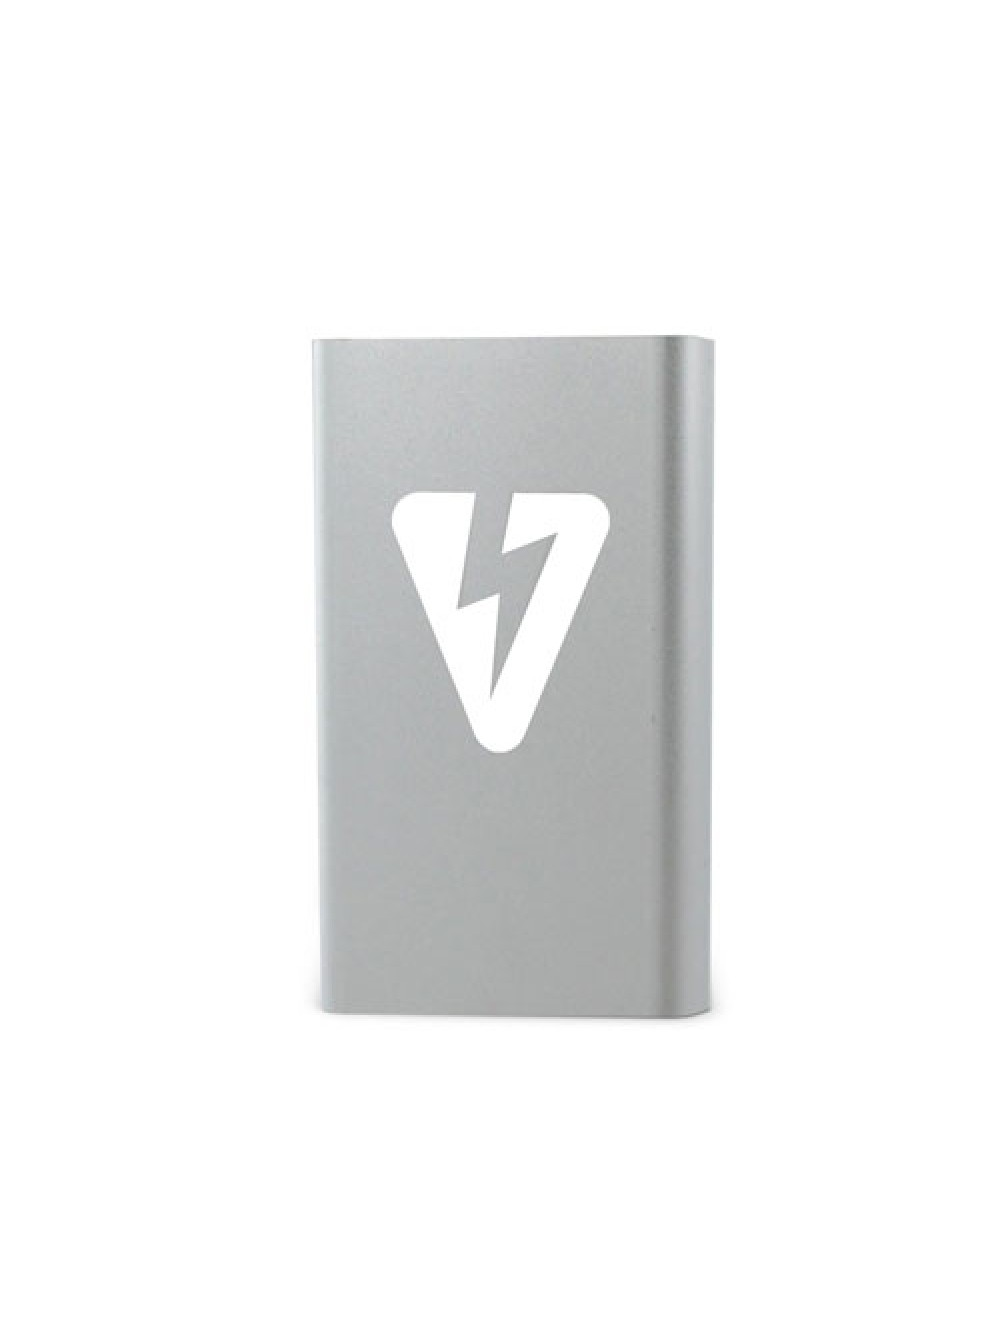 Erovoly Powerbank Silver 8717903272367